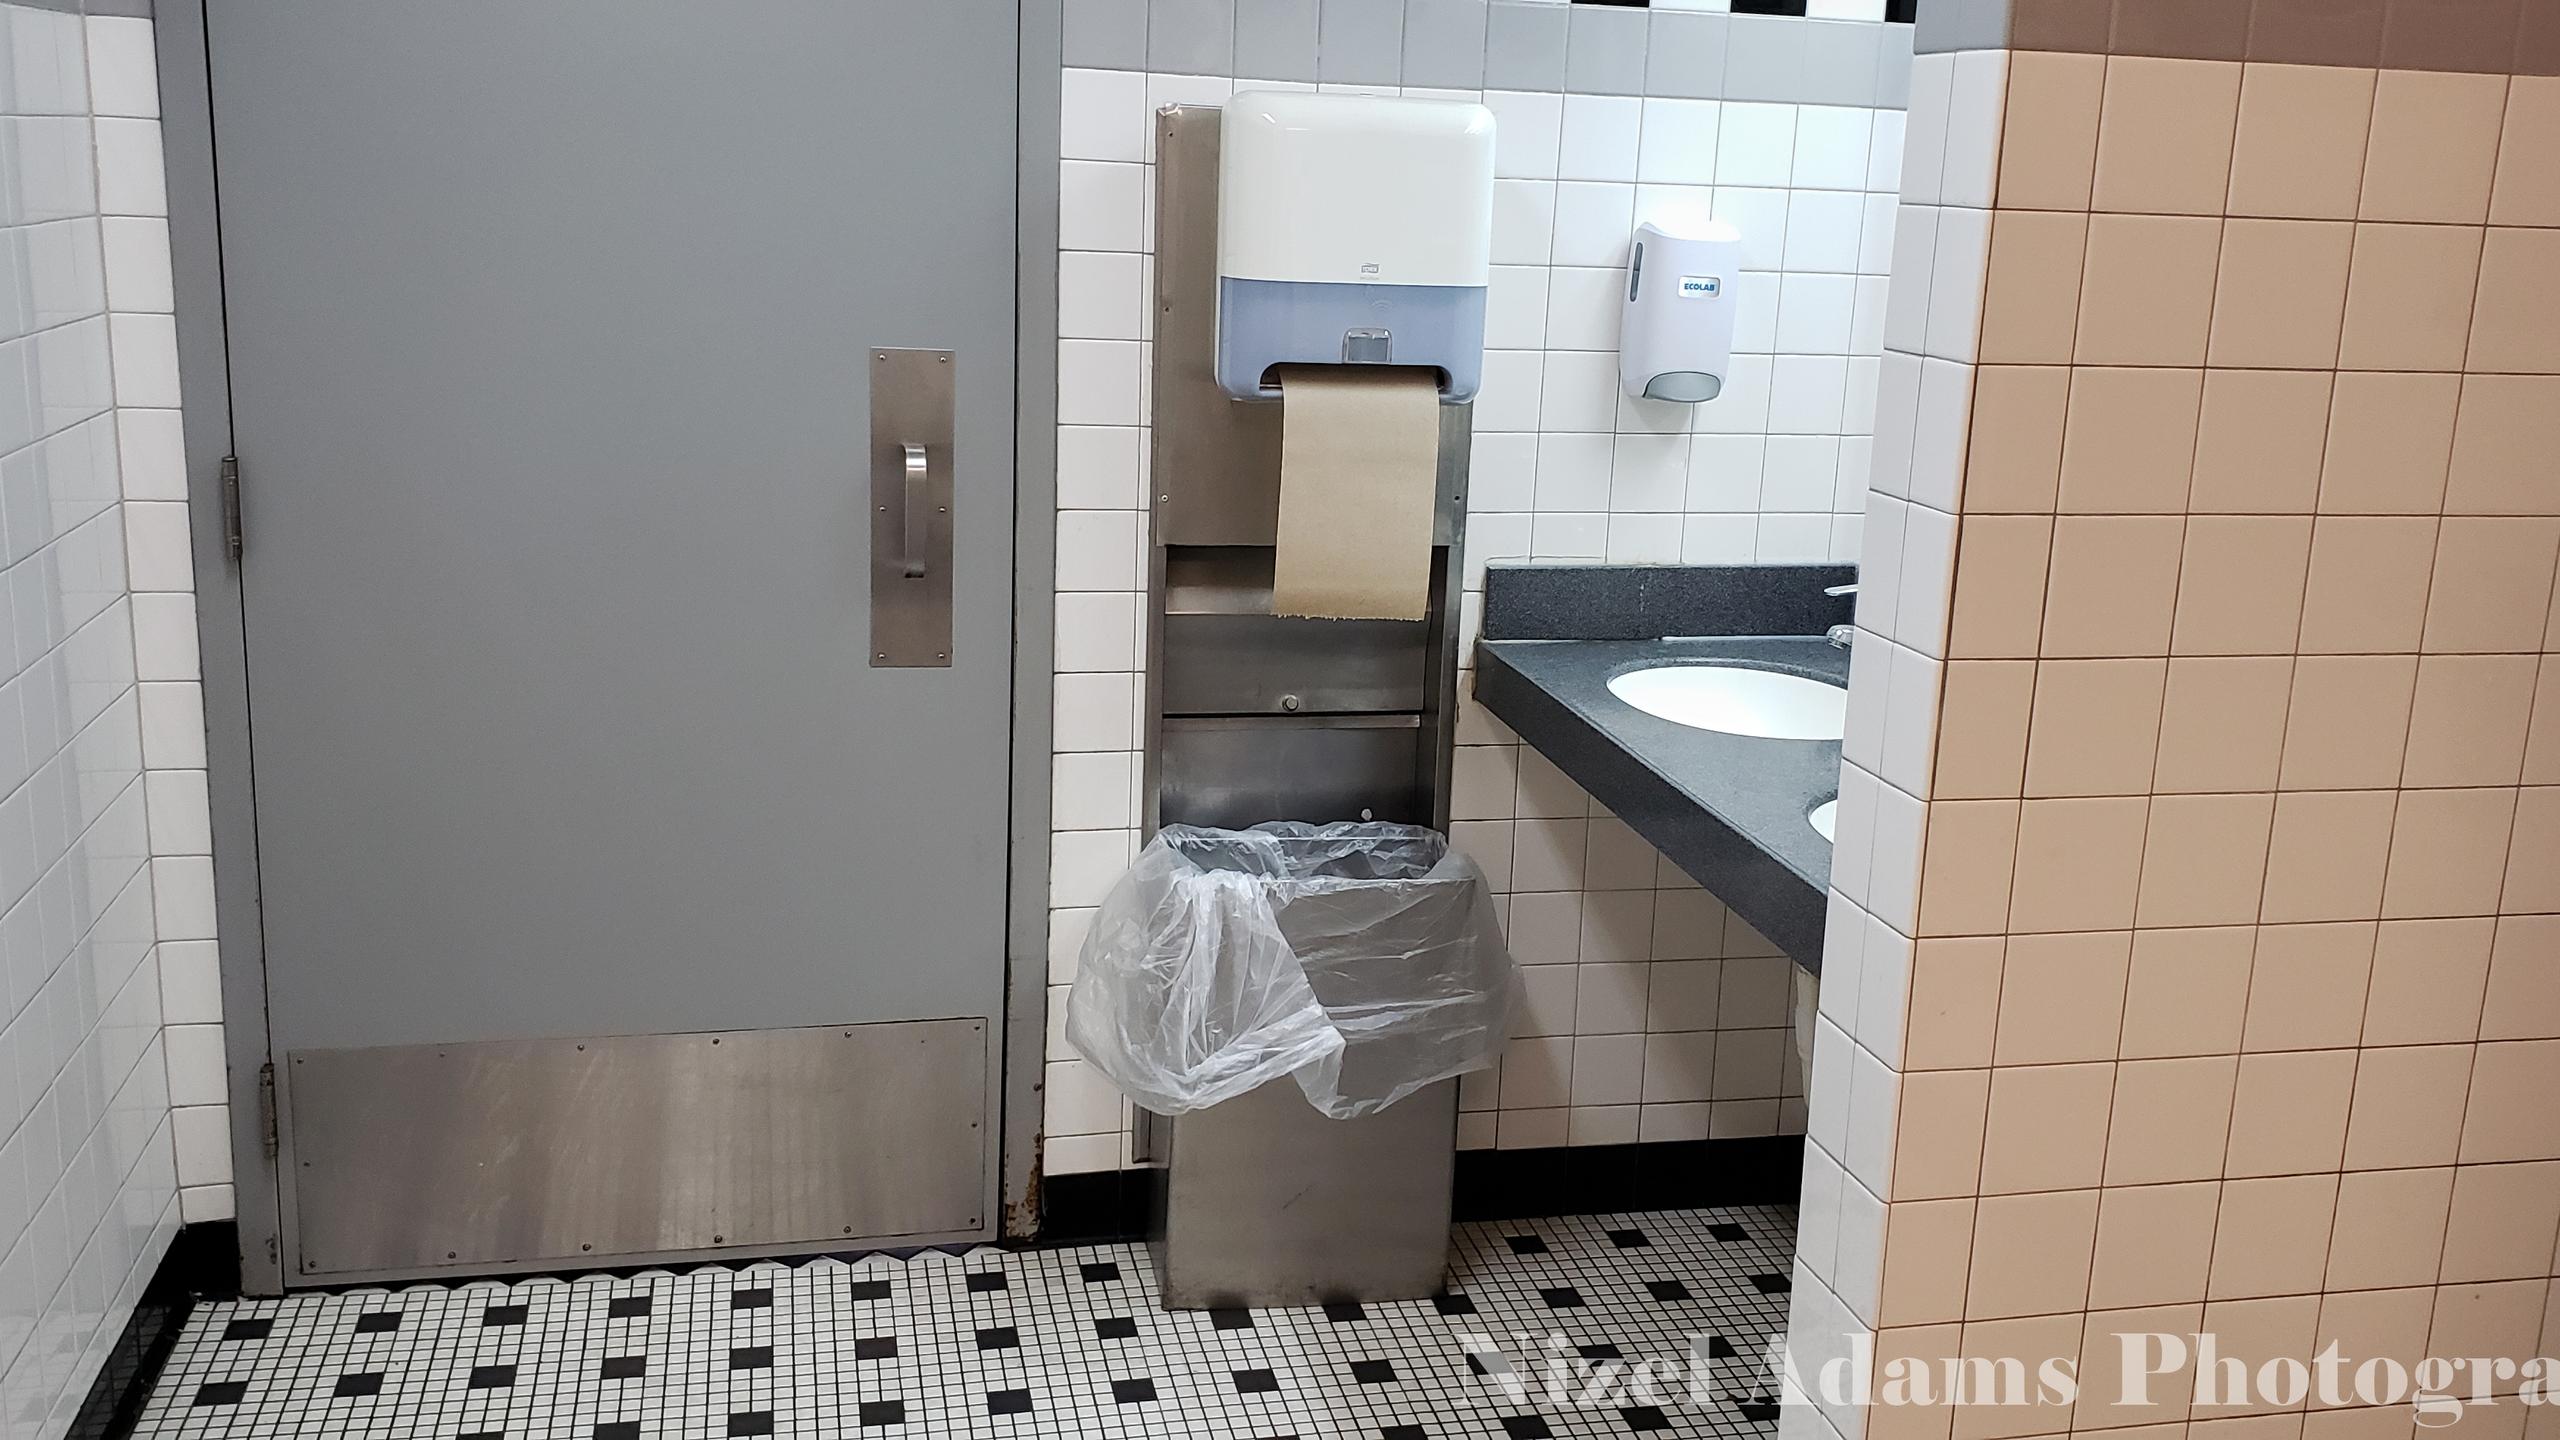 Men's Bathroom at Steak n' Shake Aurora, Illinois